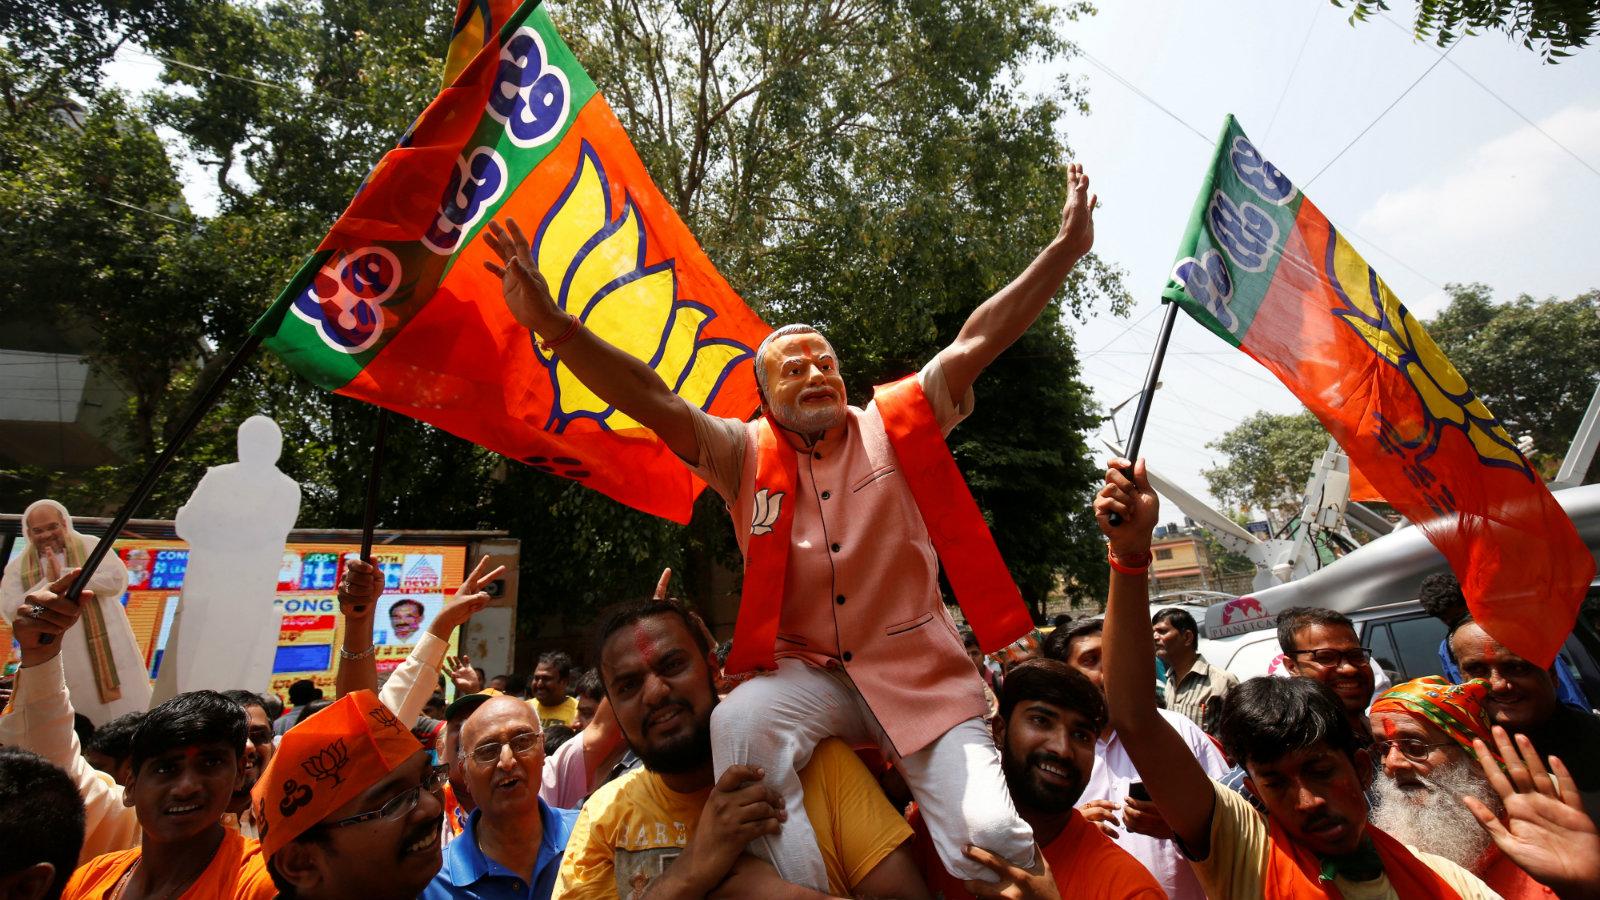 Bjp Indian National Congress Or Janata Dal Secular In